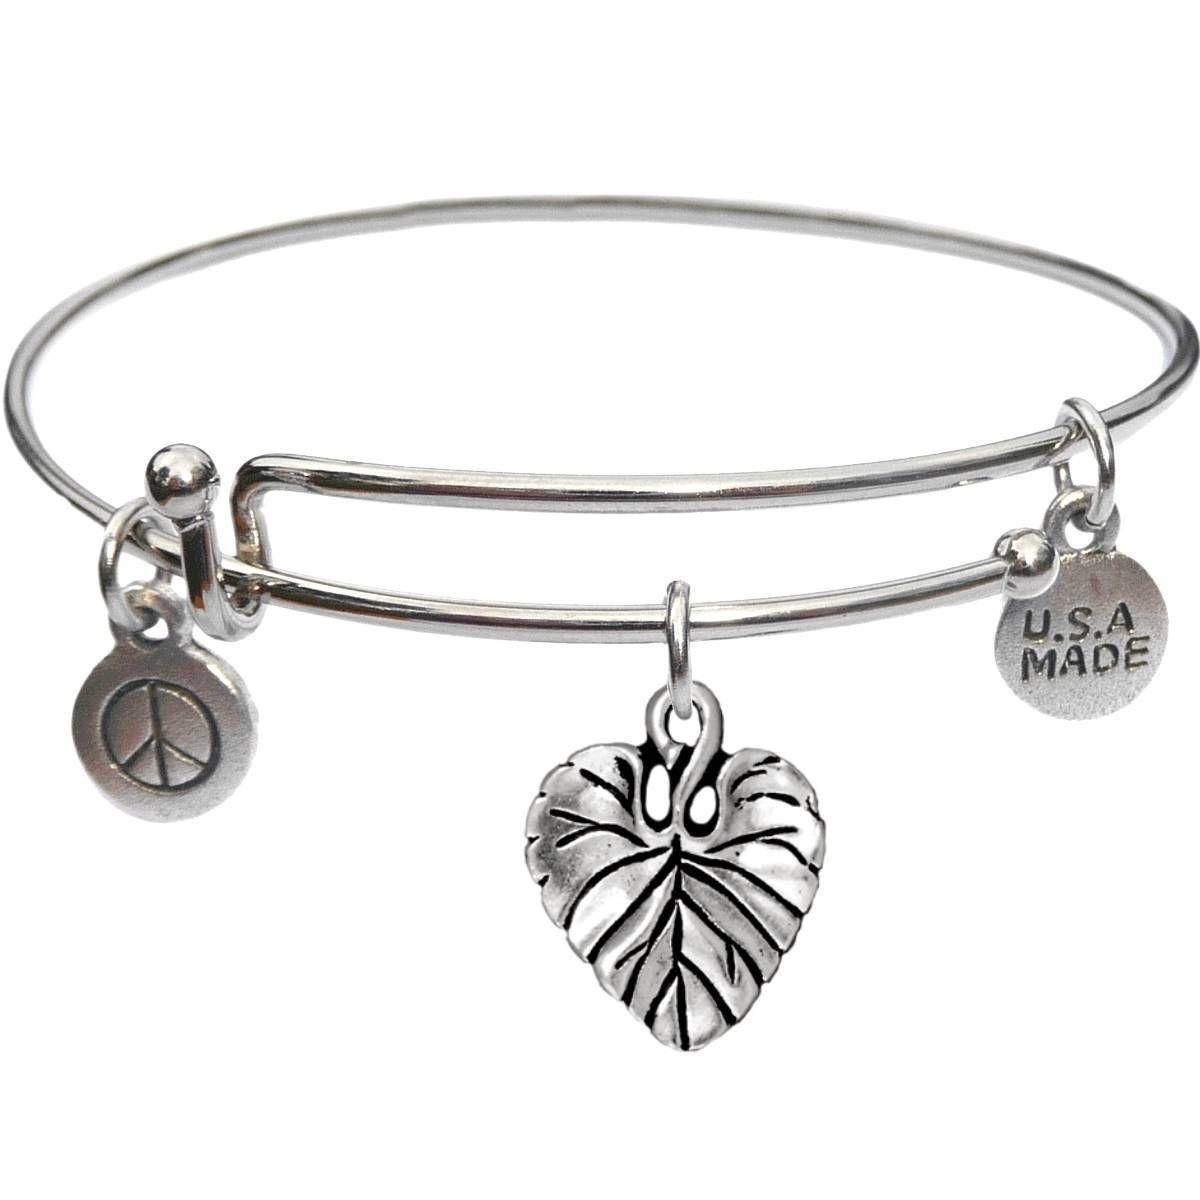 Bangle Bracelet and Leaf - USA Made - BBandJT171